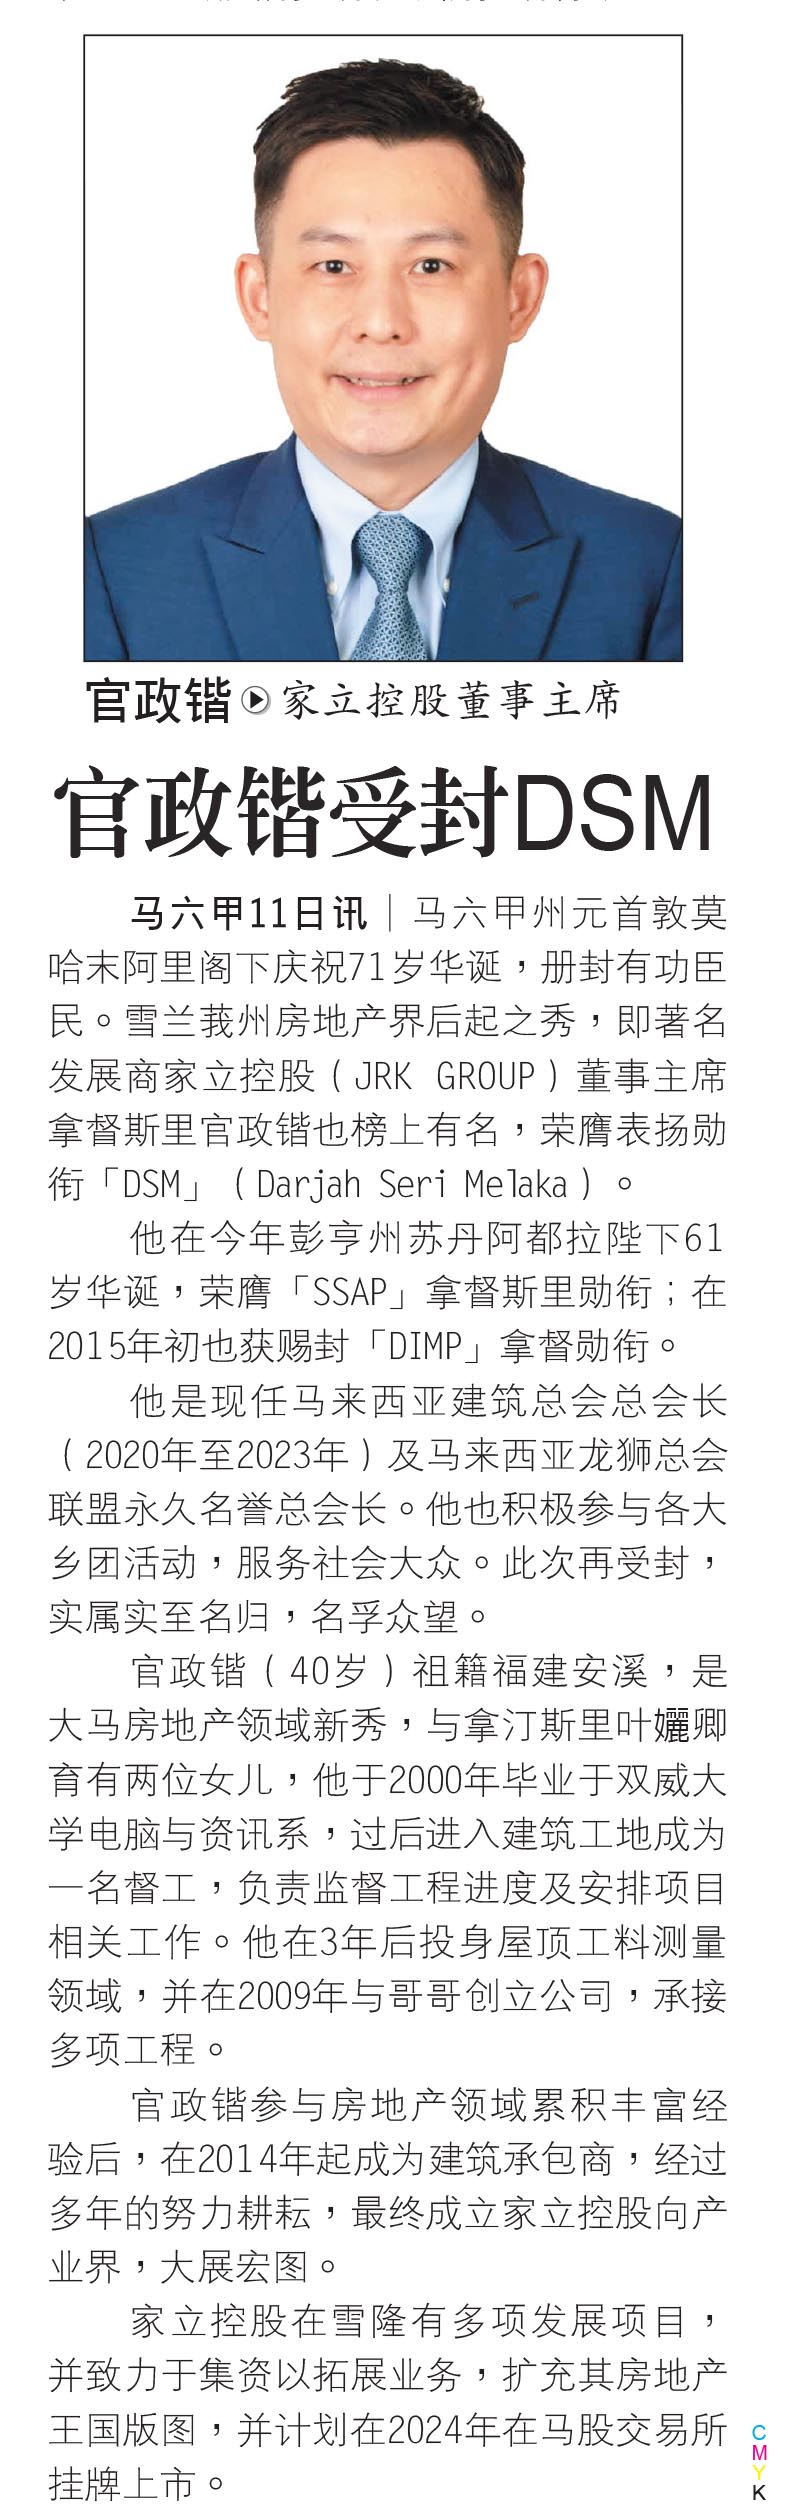 20201012 DSM Title Write-Up (Oriental Daily)